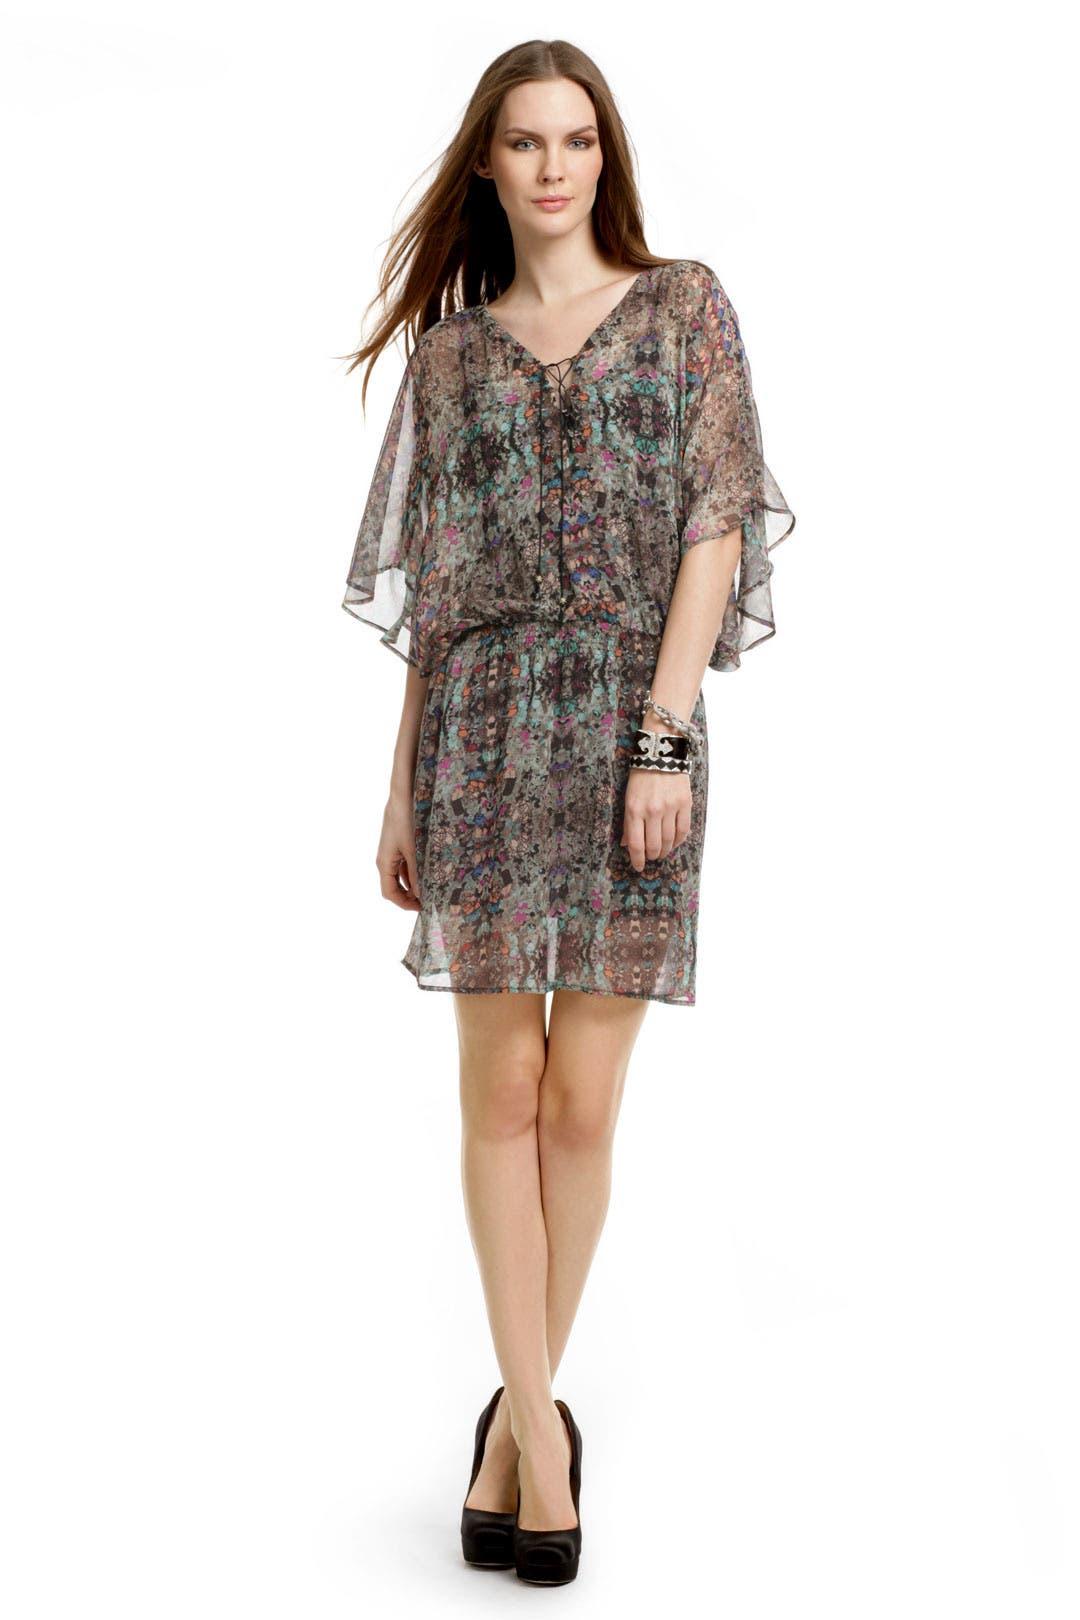 Fairytale Dream Dress by Twelfth Street by Cynthia Vincent